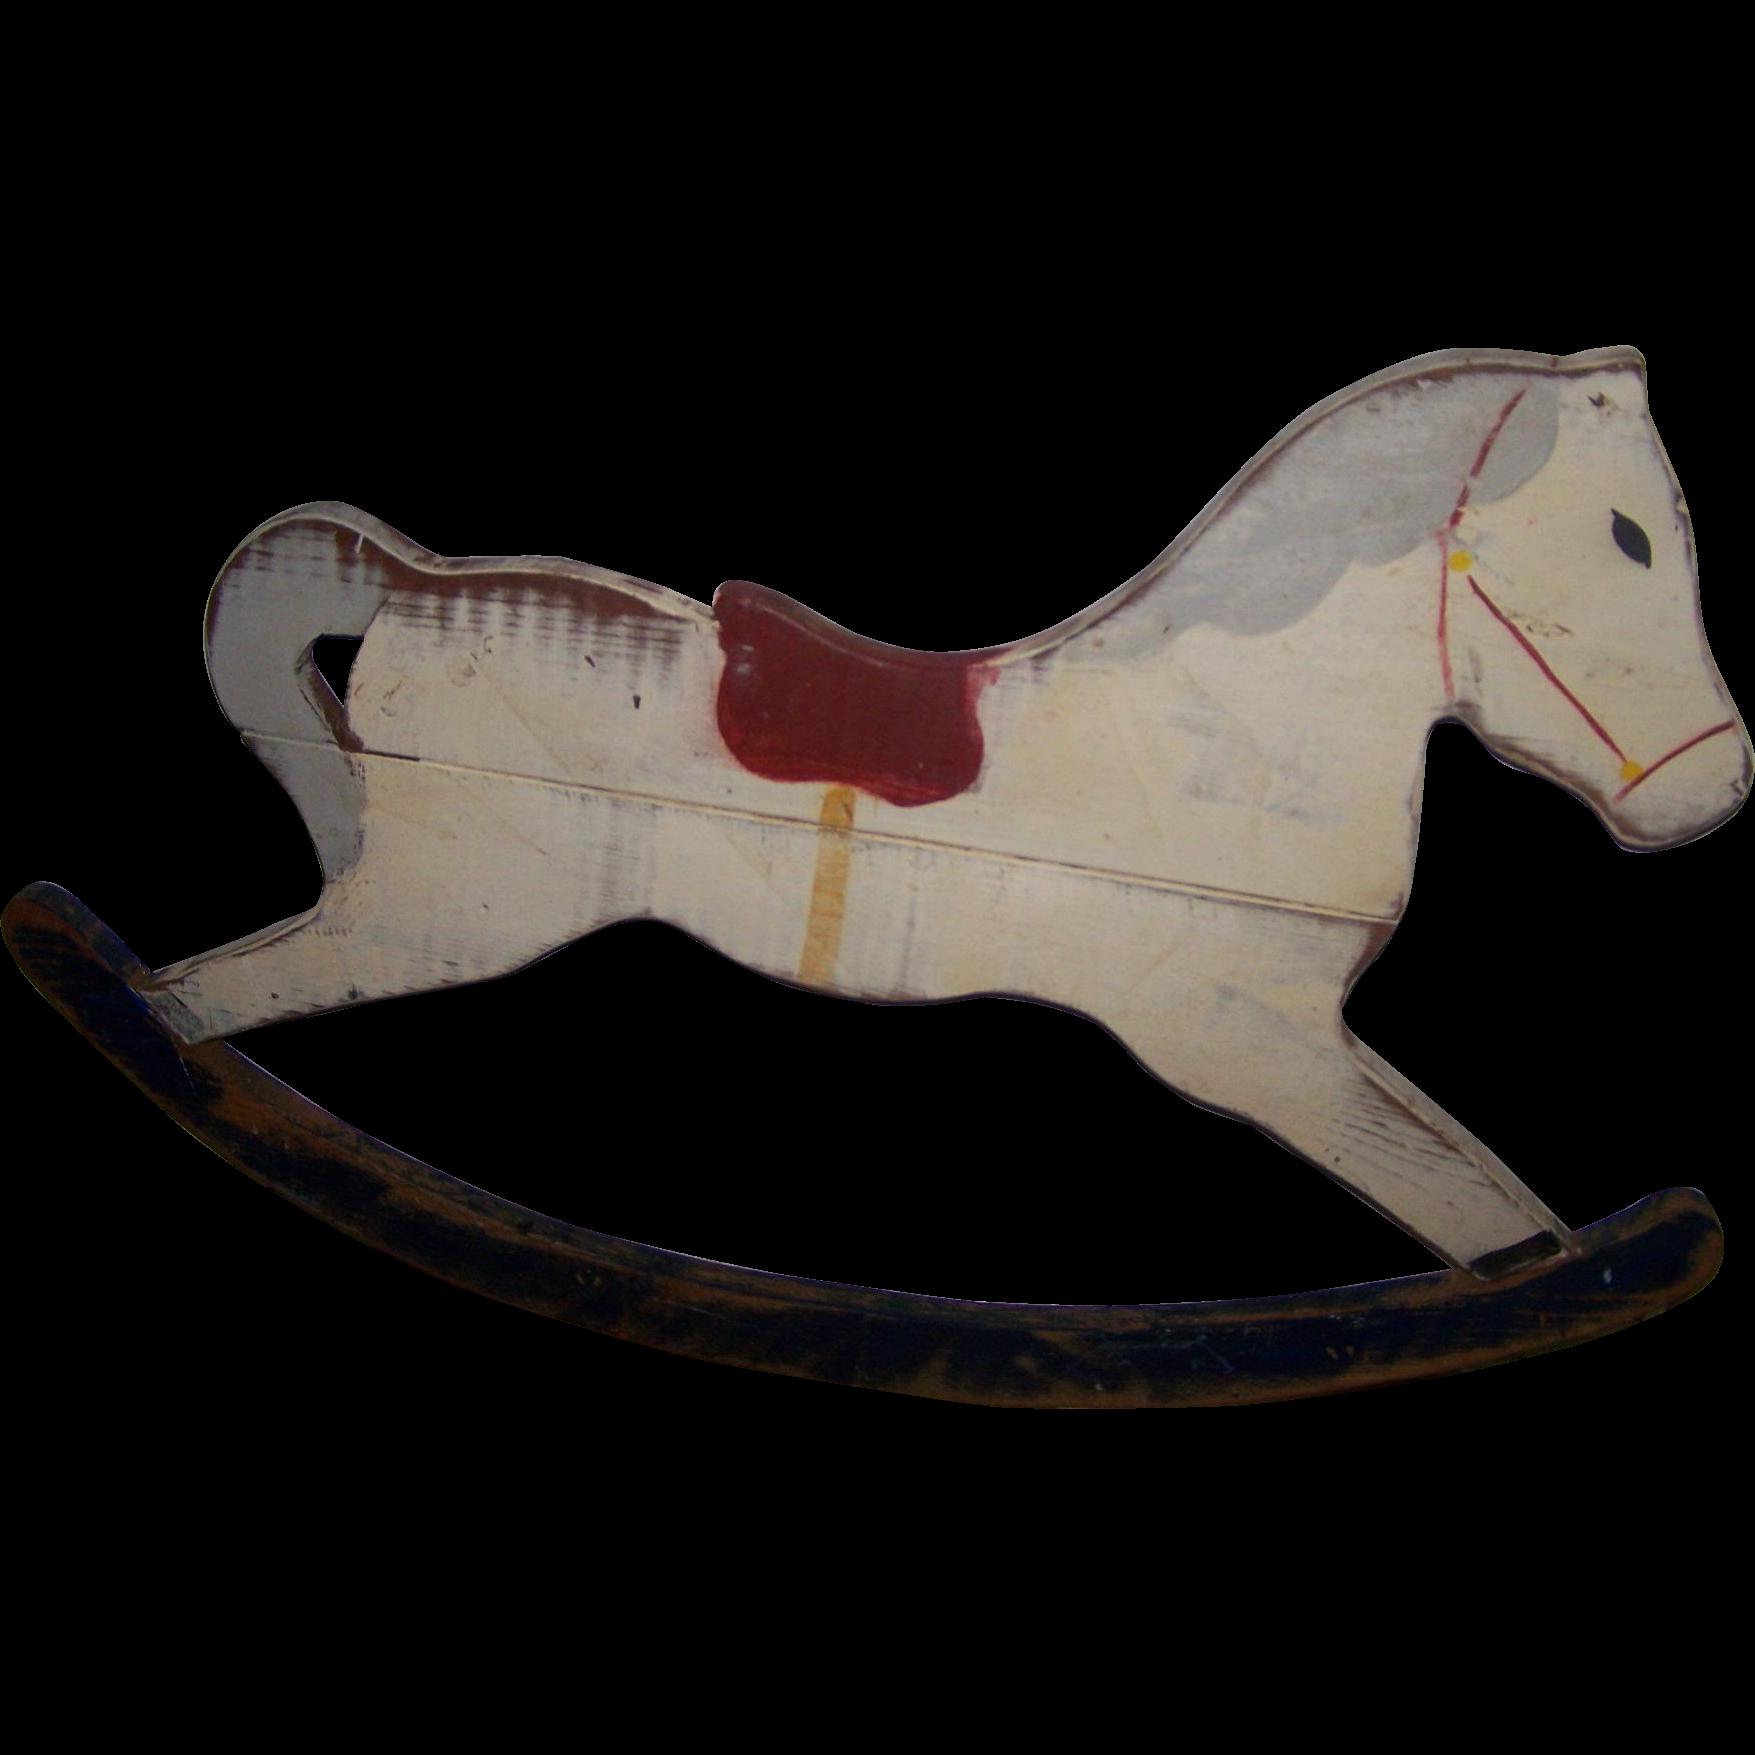 Wooden rocking horse folk art hand crafted painted rocking for Hand crafted rocking horse